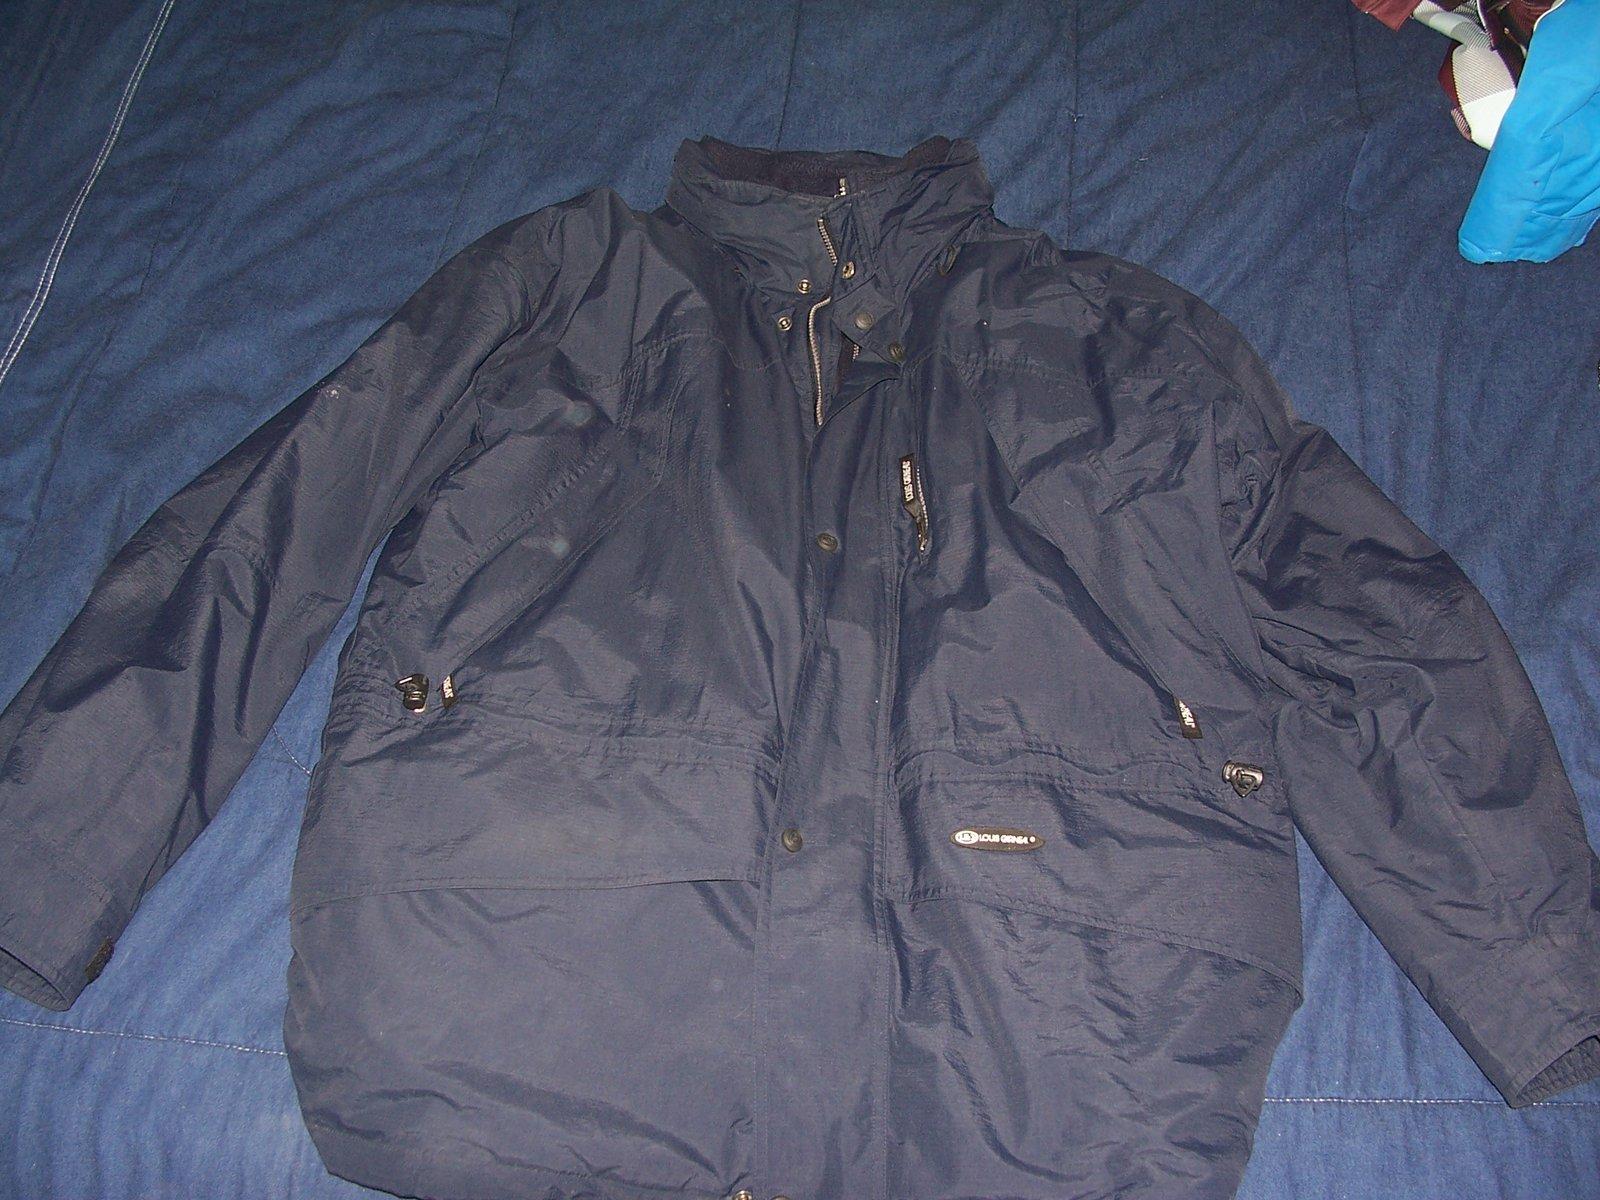 Jacket for sale2